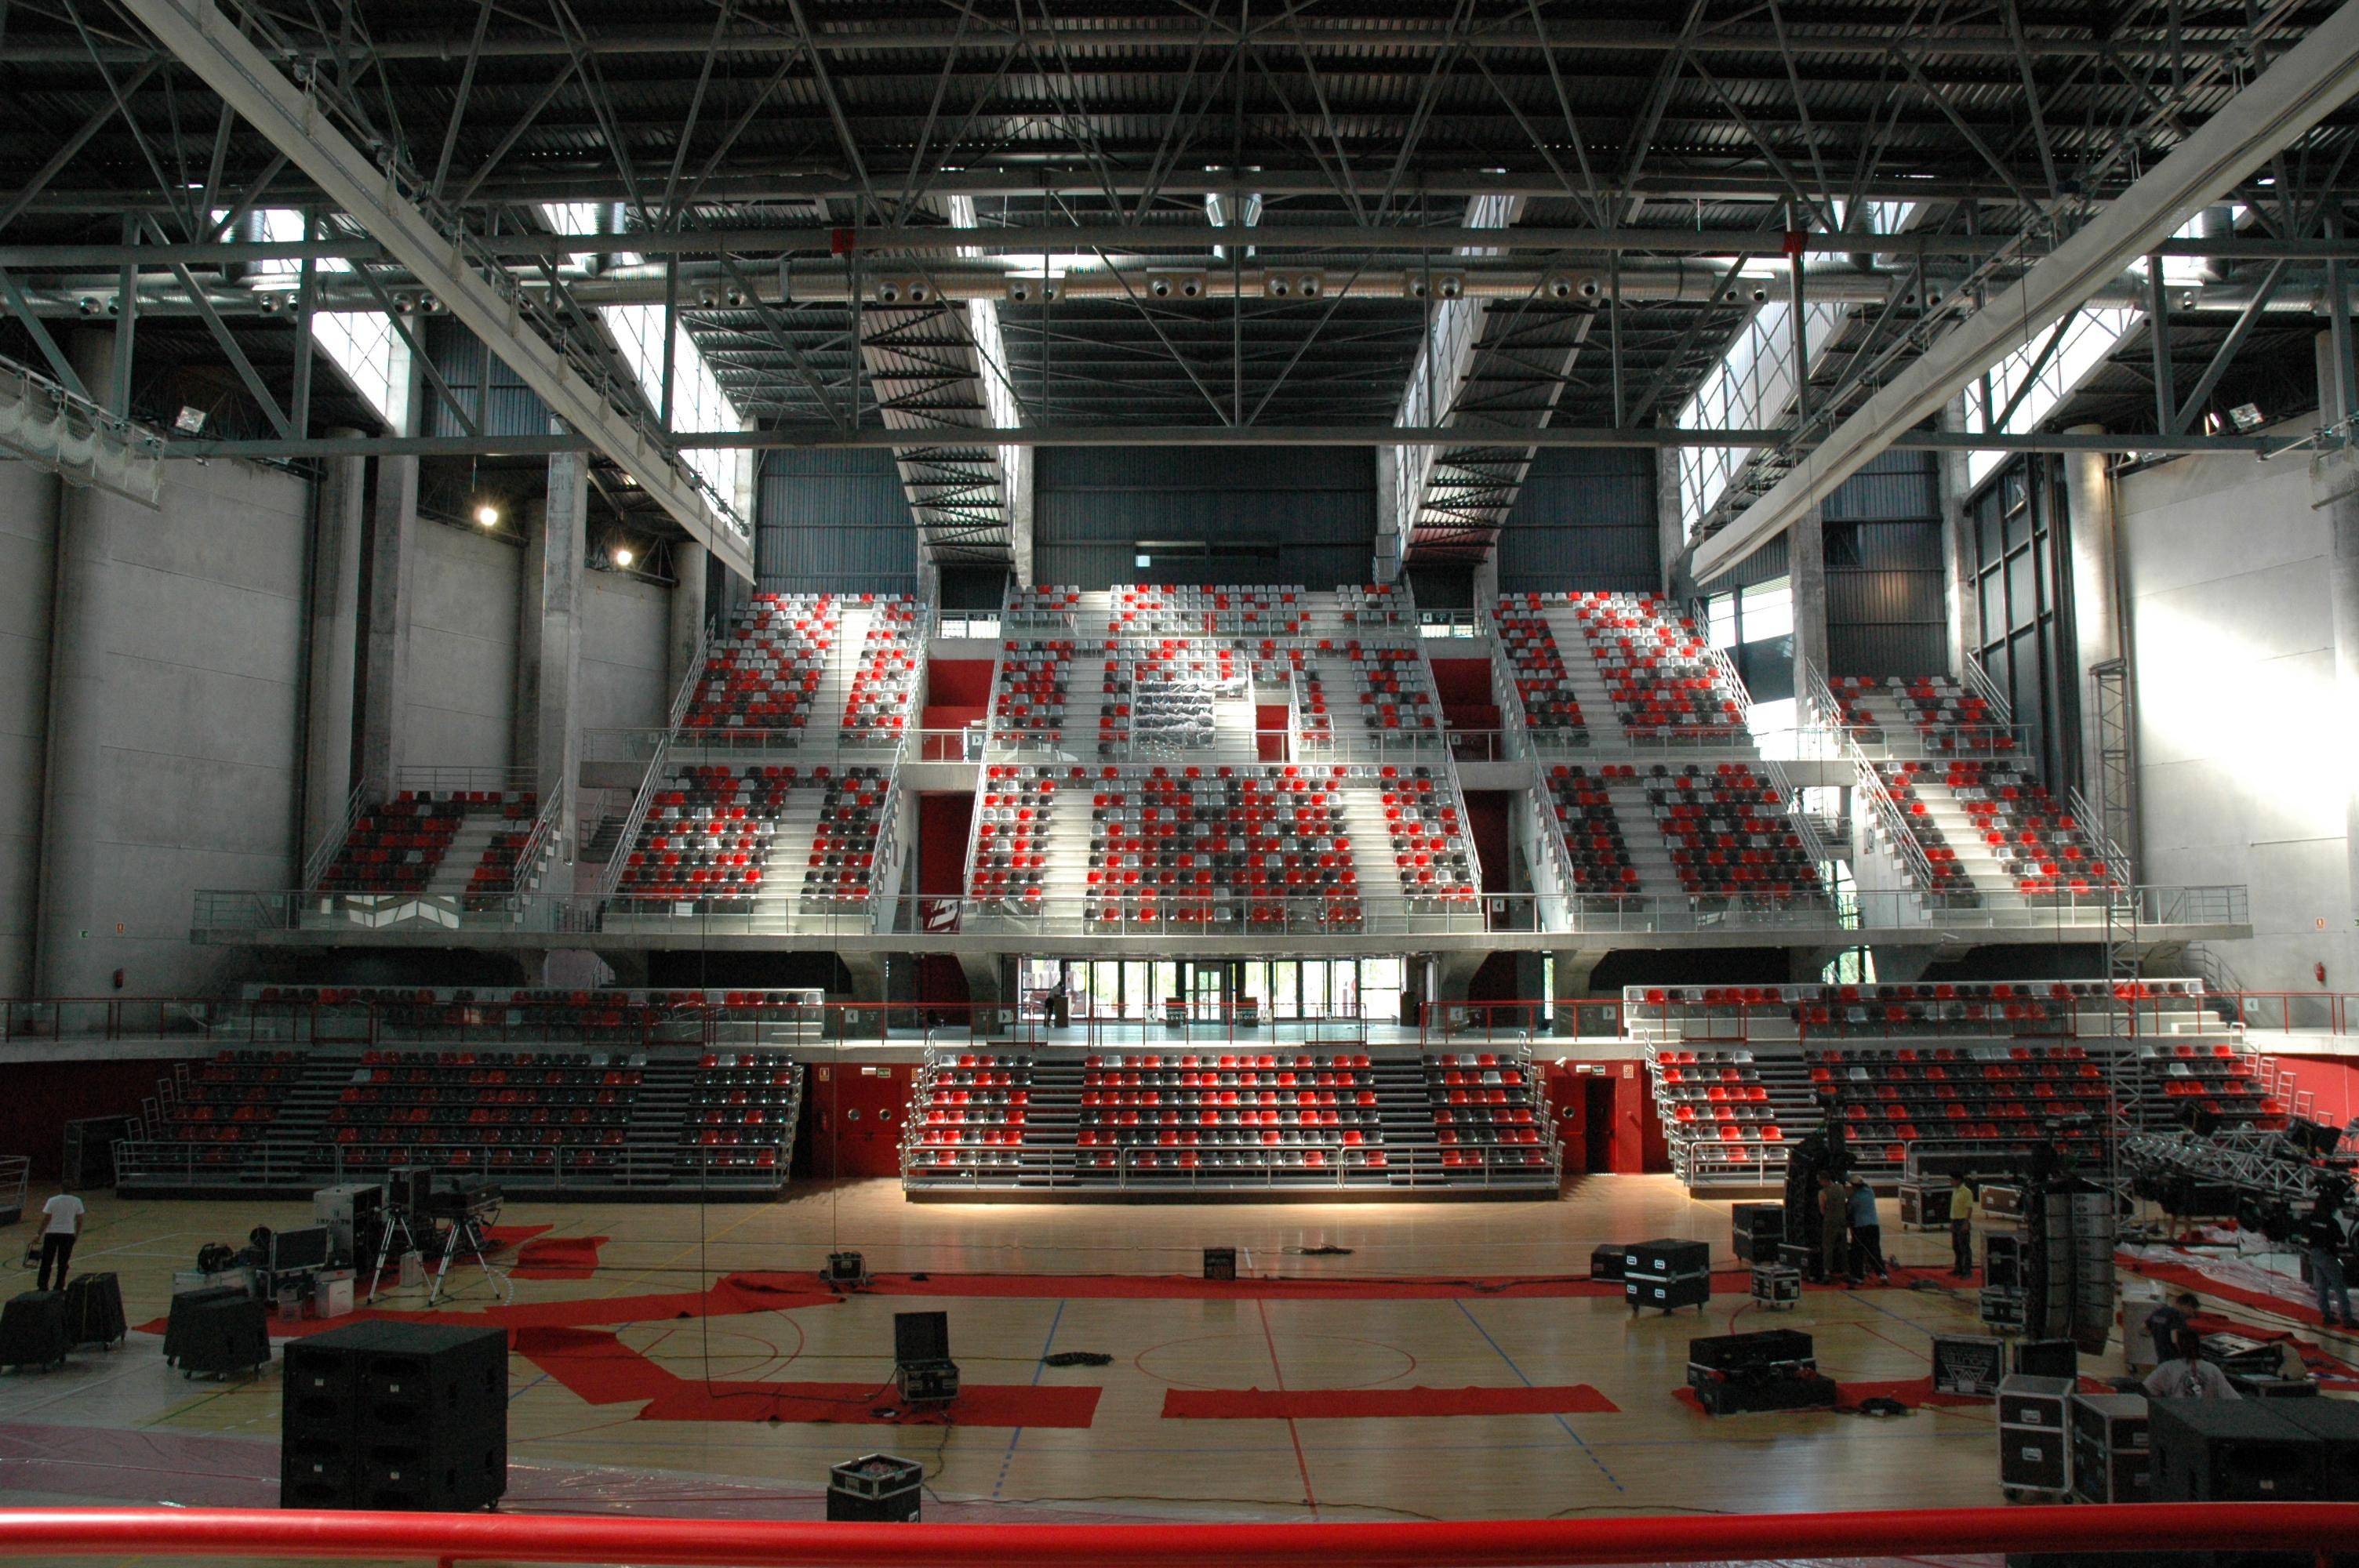 Polideportivo Municipal Principes de Asturias en Pinto